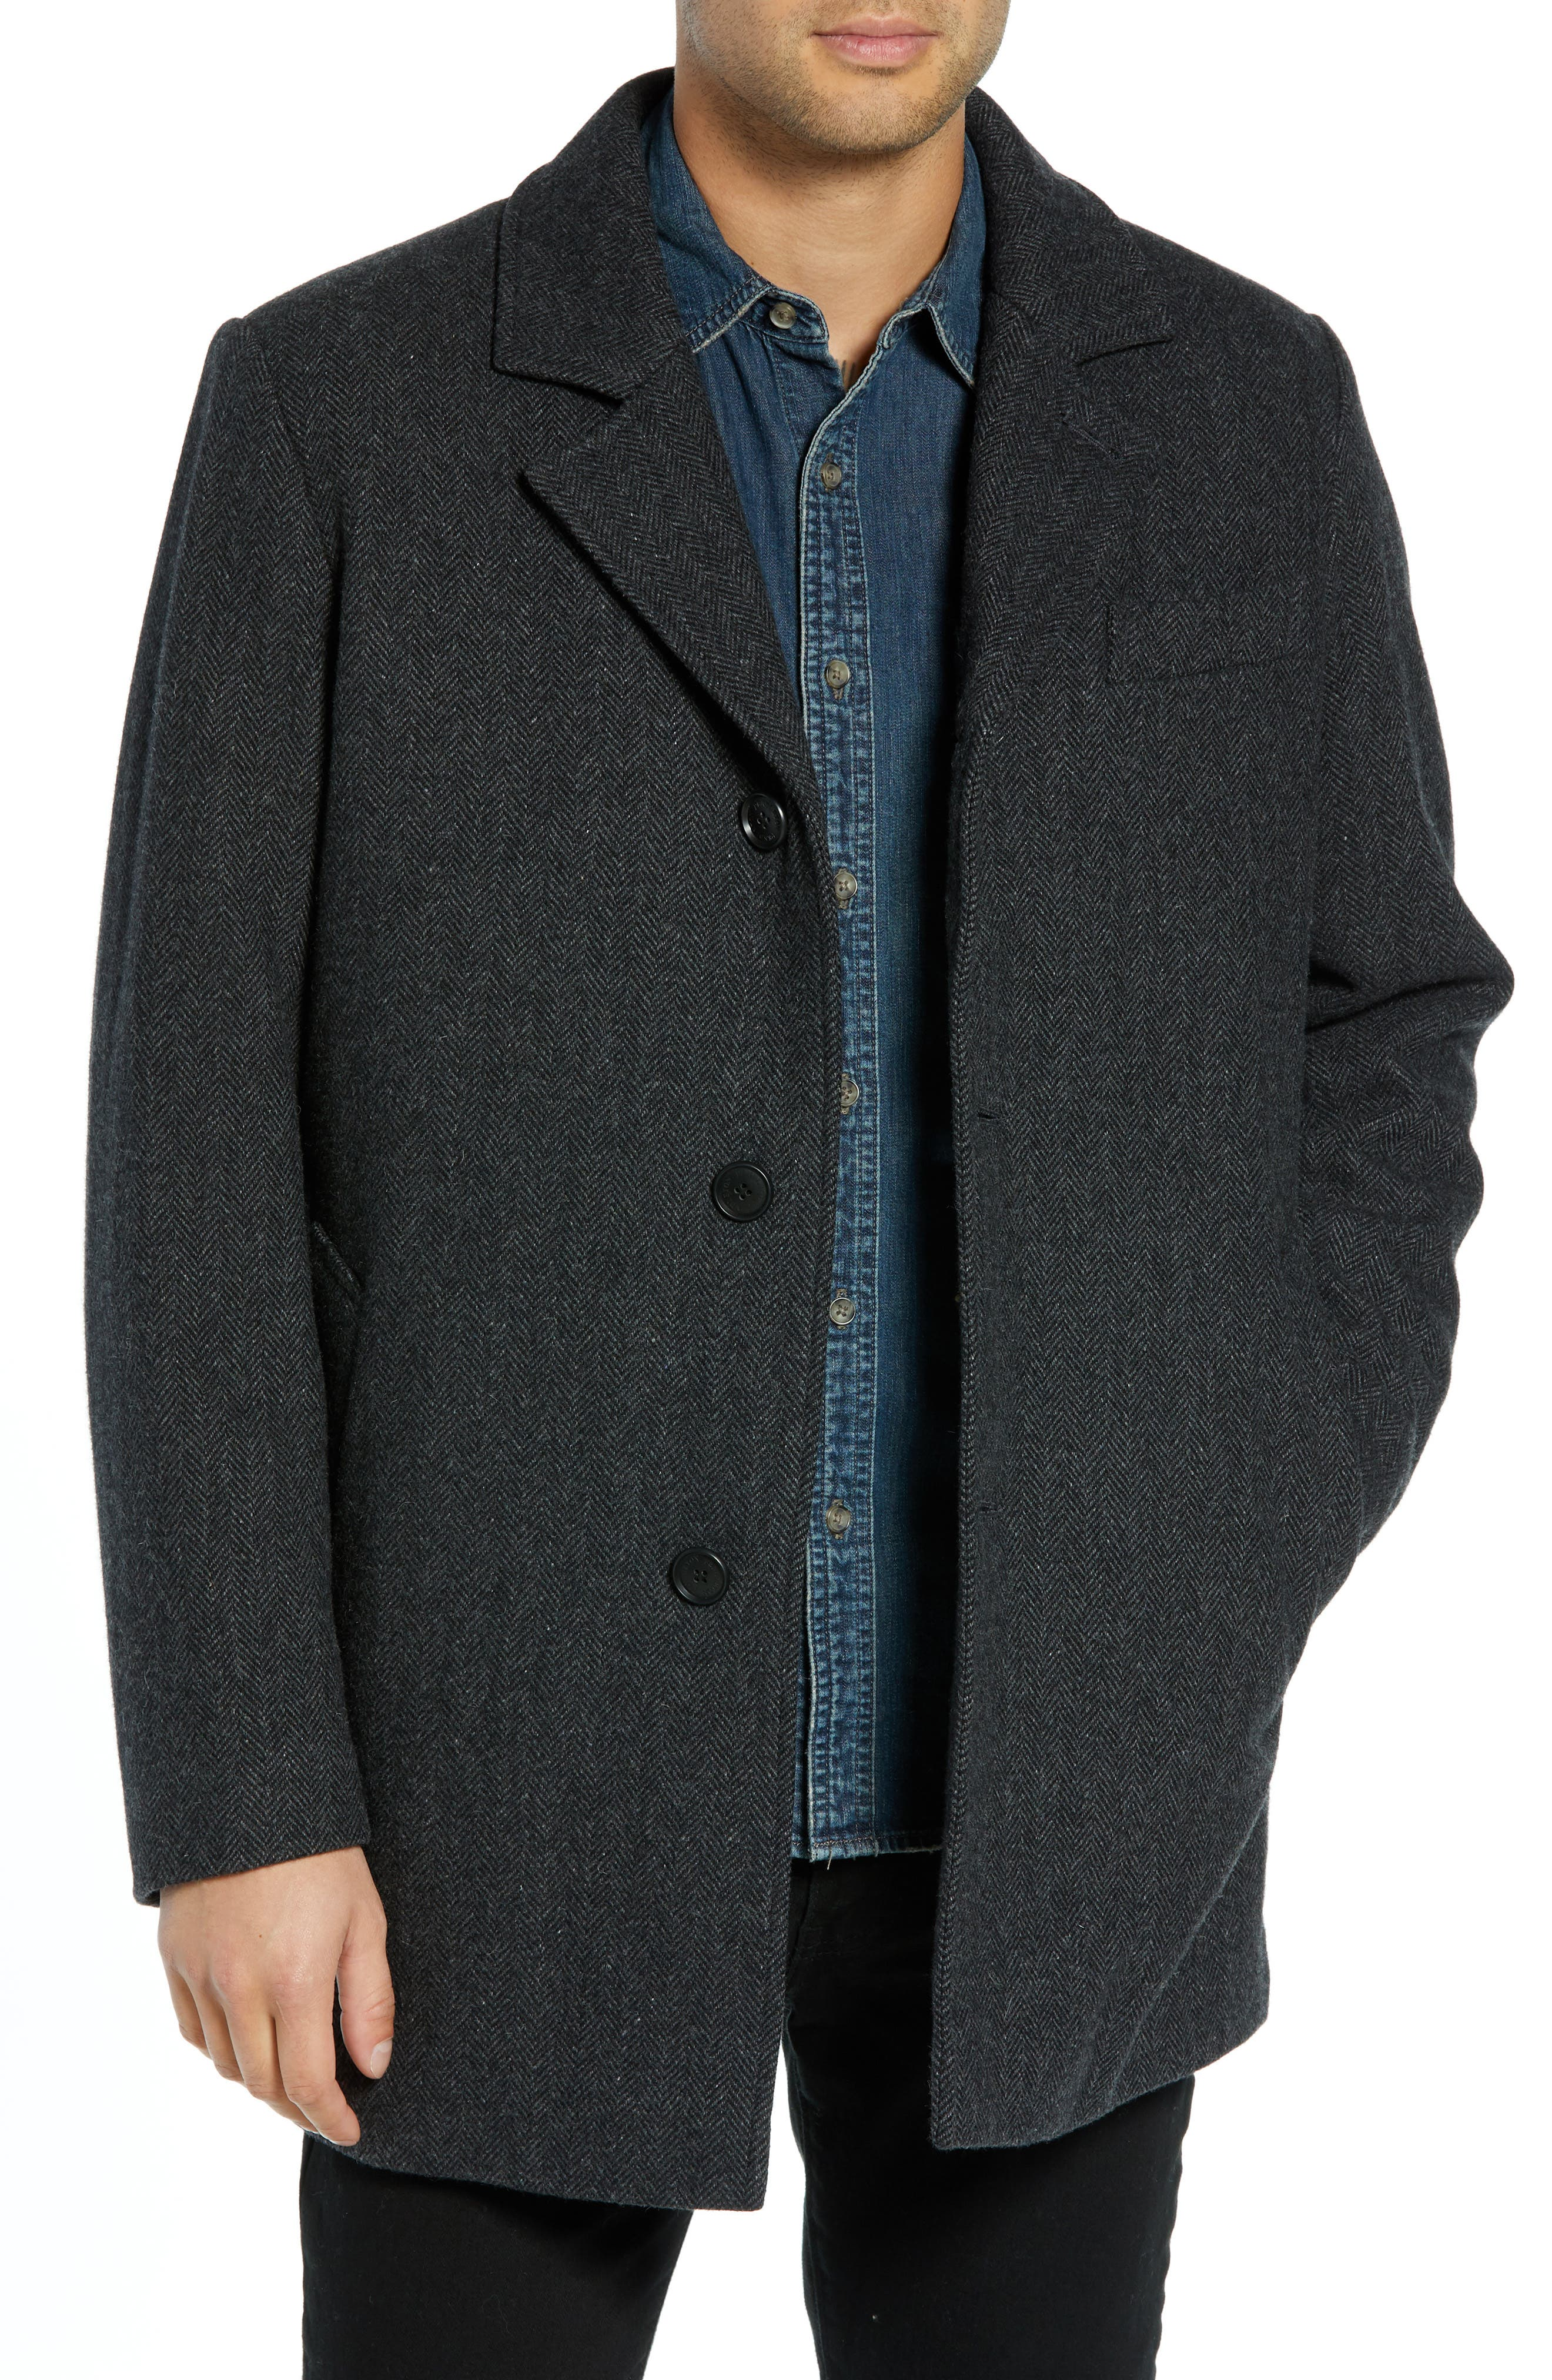 PENDLETON Iconic Textures Manhattan Wool Blend Top Coat, Main, color, CHARCOAL HERRINGBONE